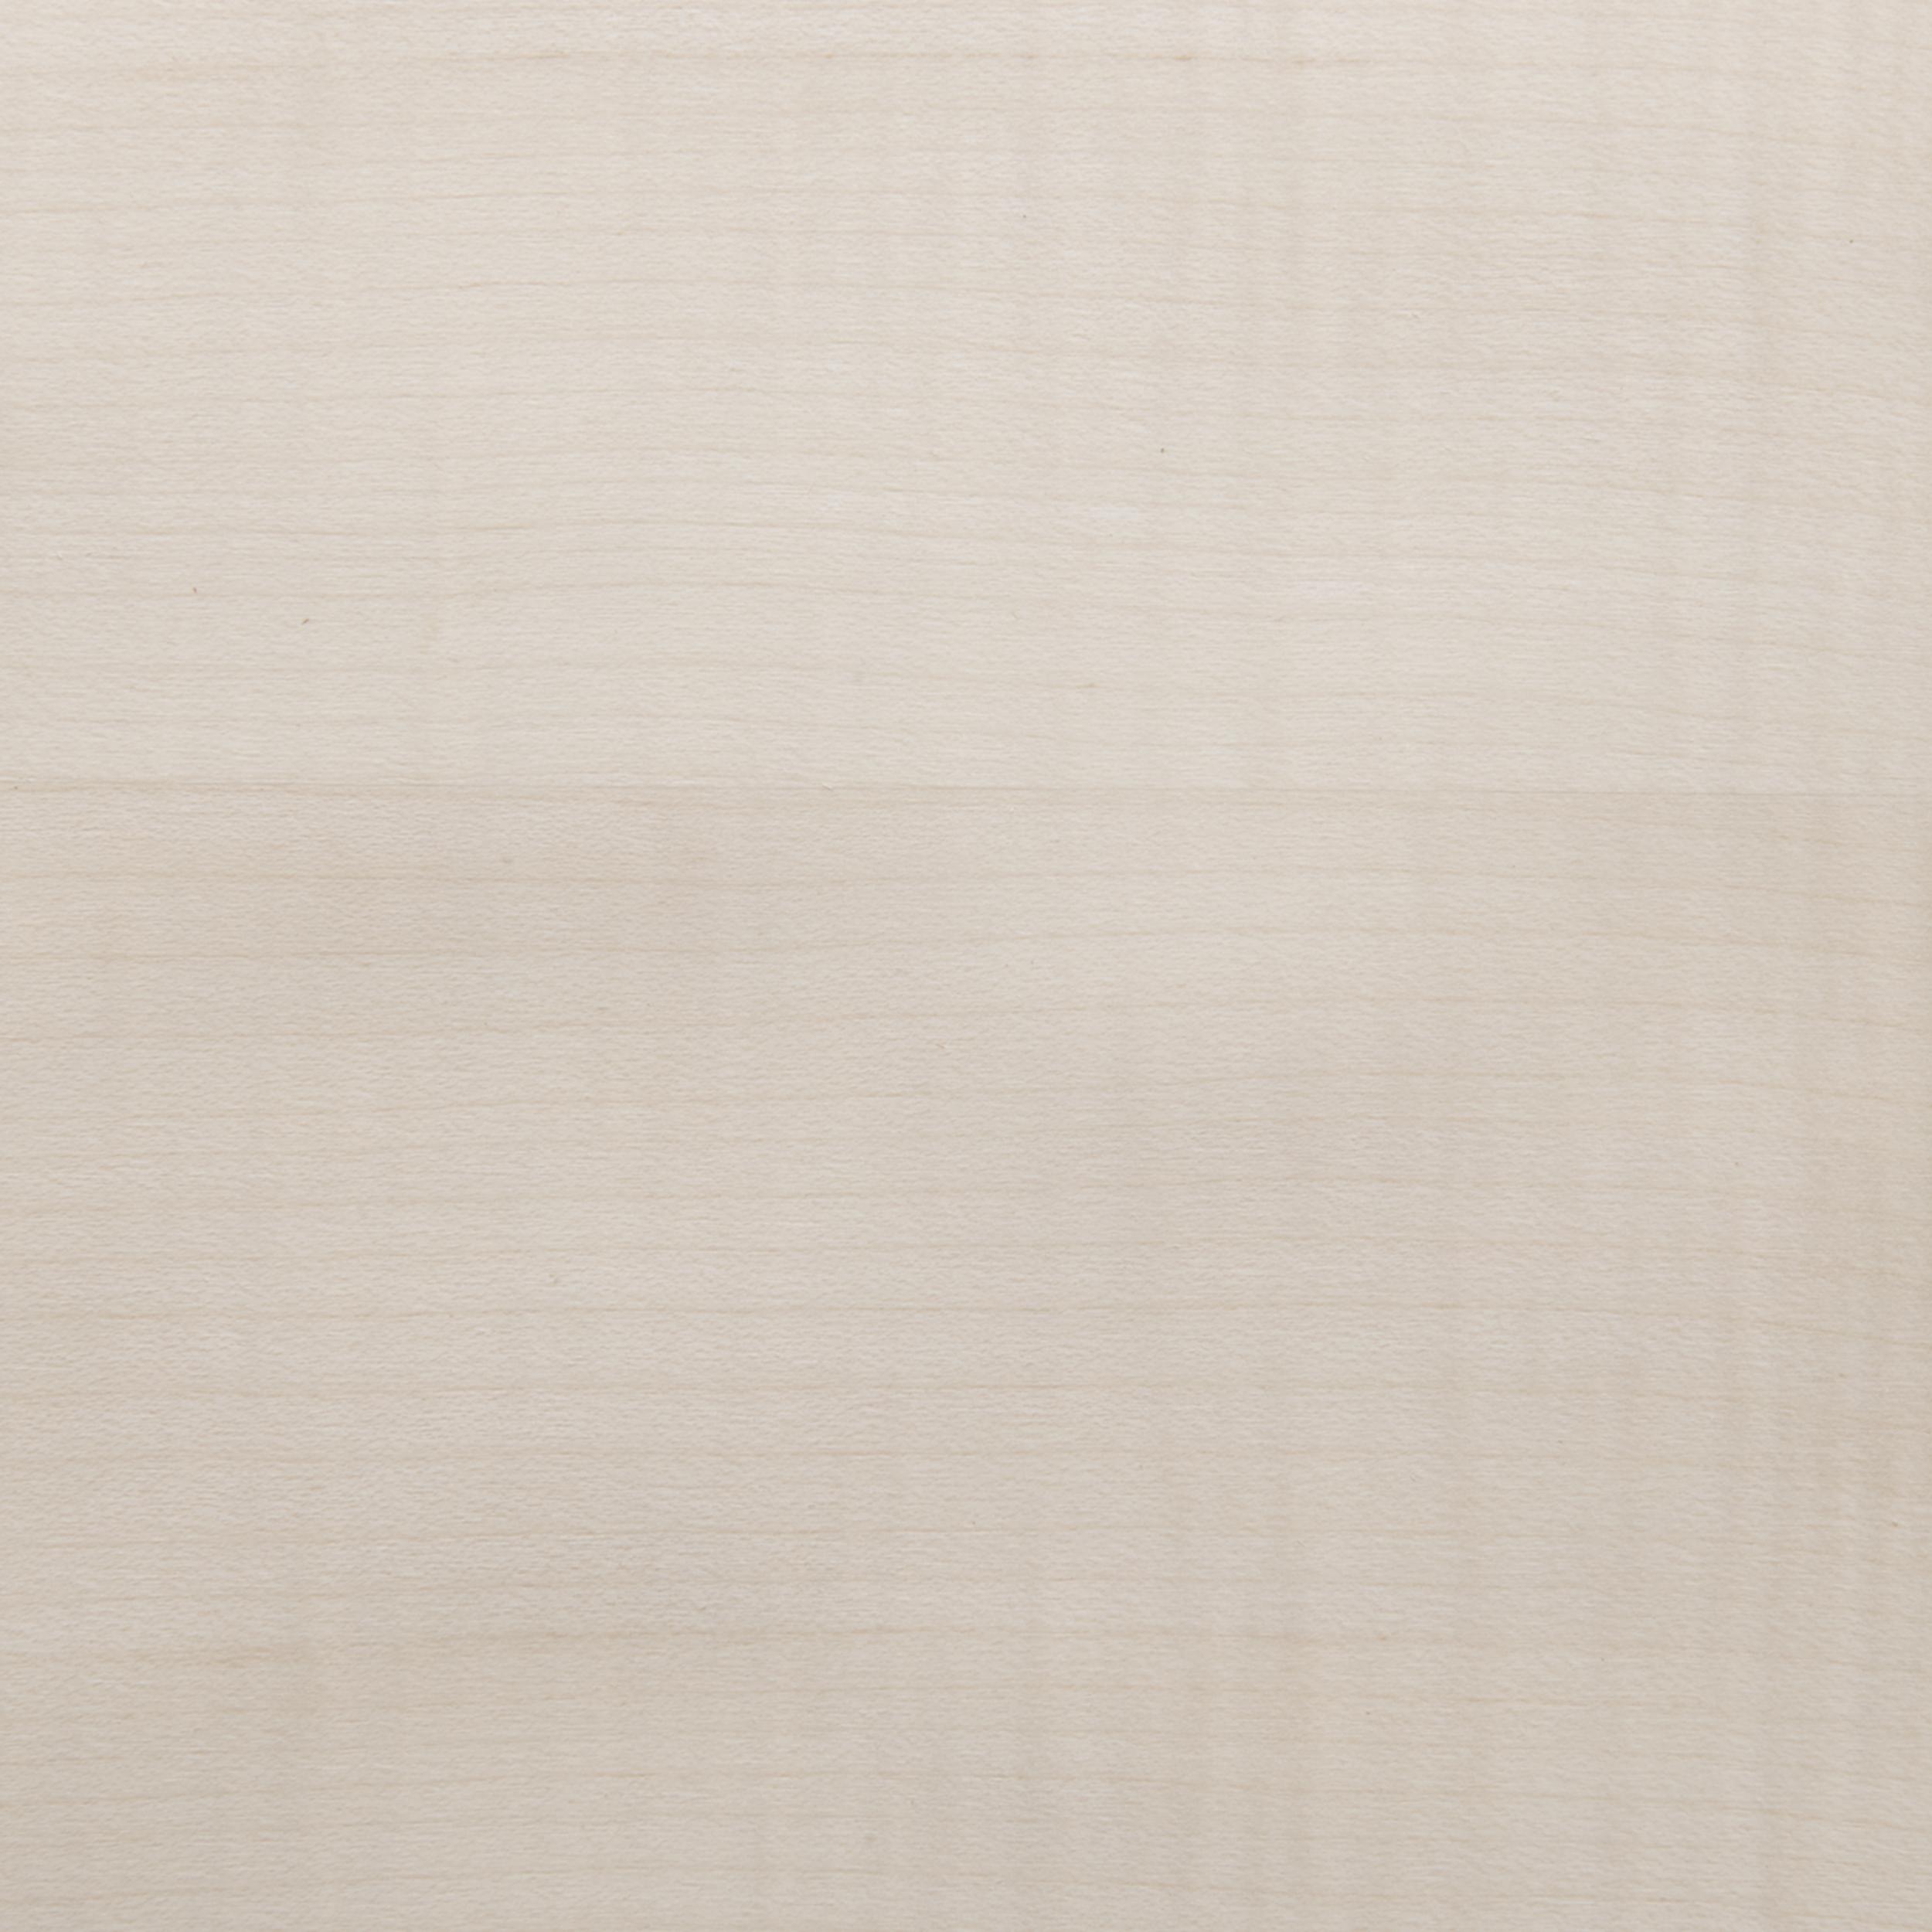 Figured Sycamore, Quartersawn 4'X8' Veneer Sheet, 3M PSA Backed